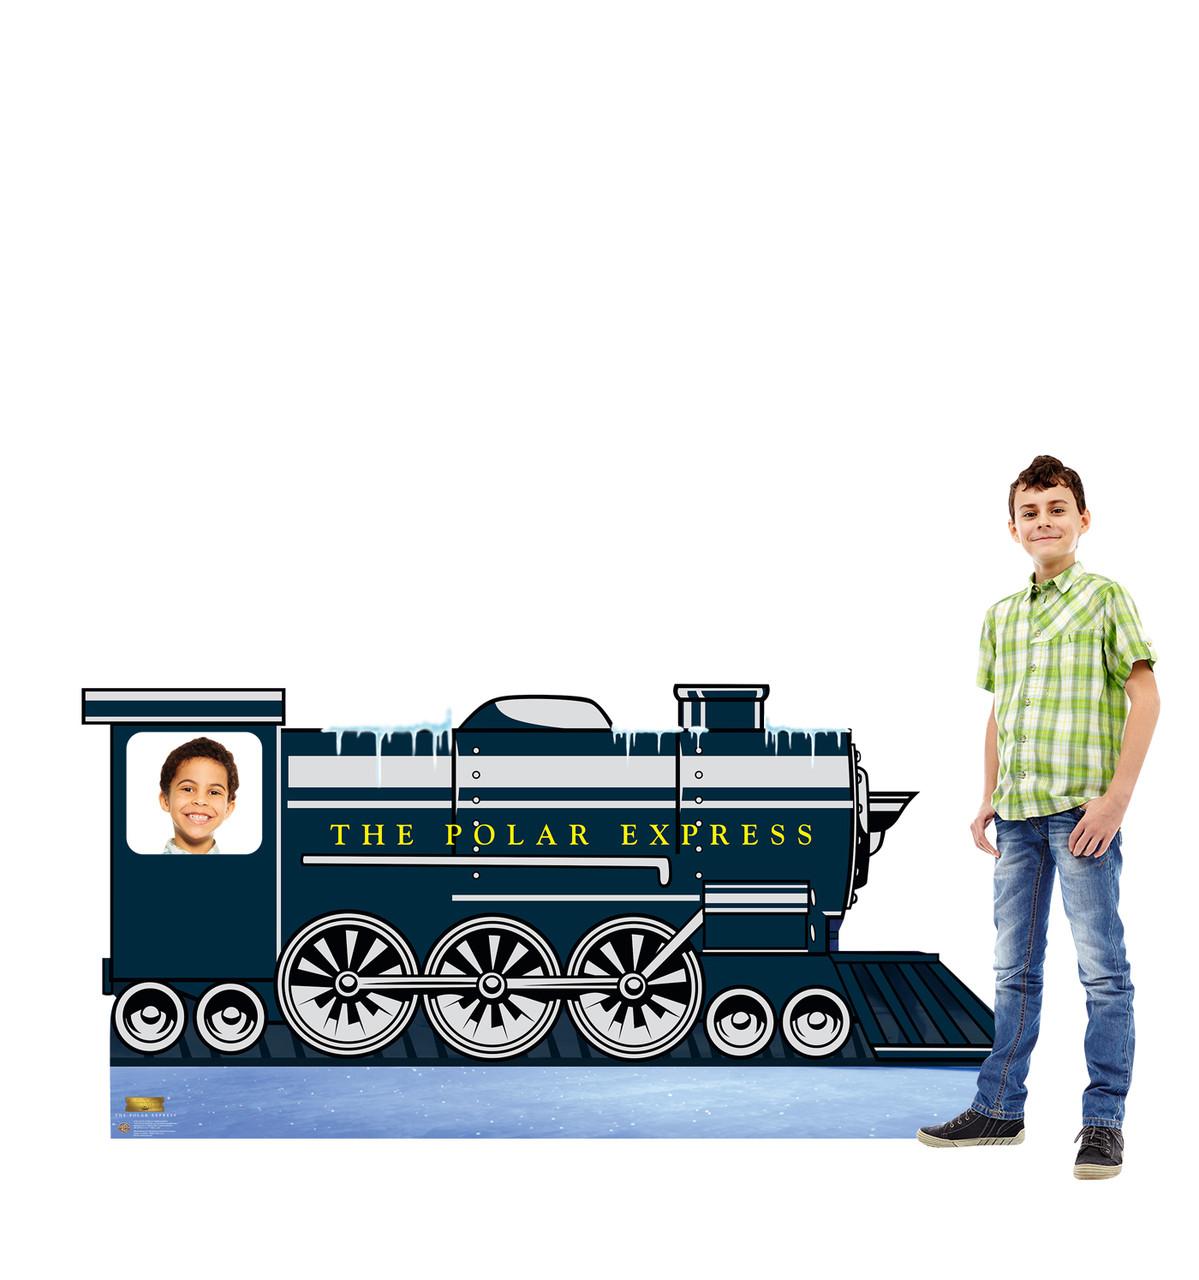 Life-size cardboard standee of the Polar Express Train Stand-in from The Polar Express with model.